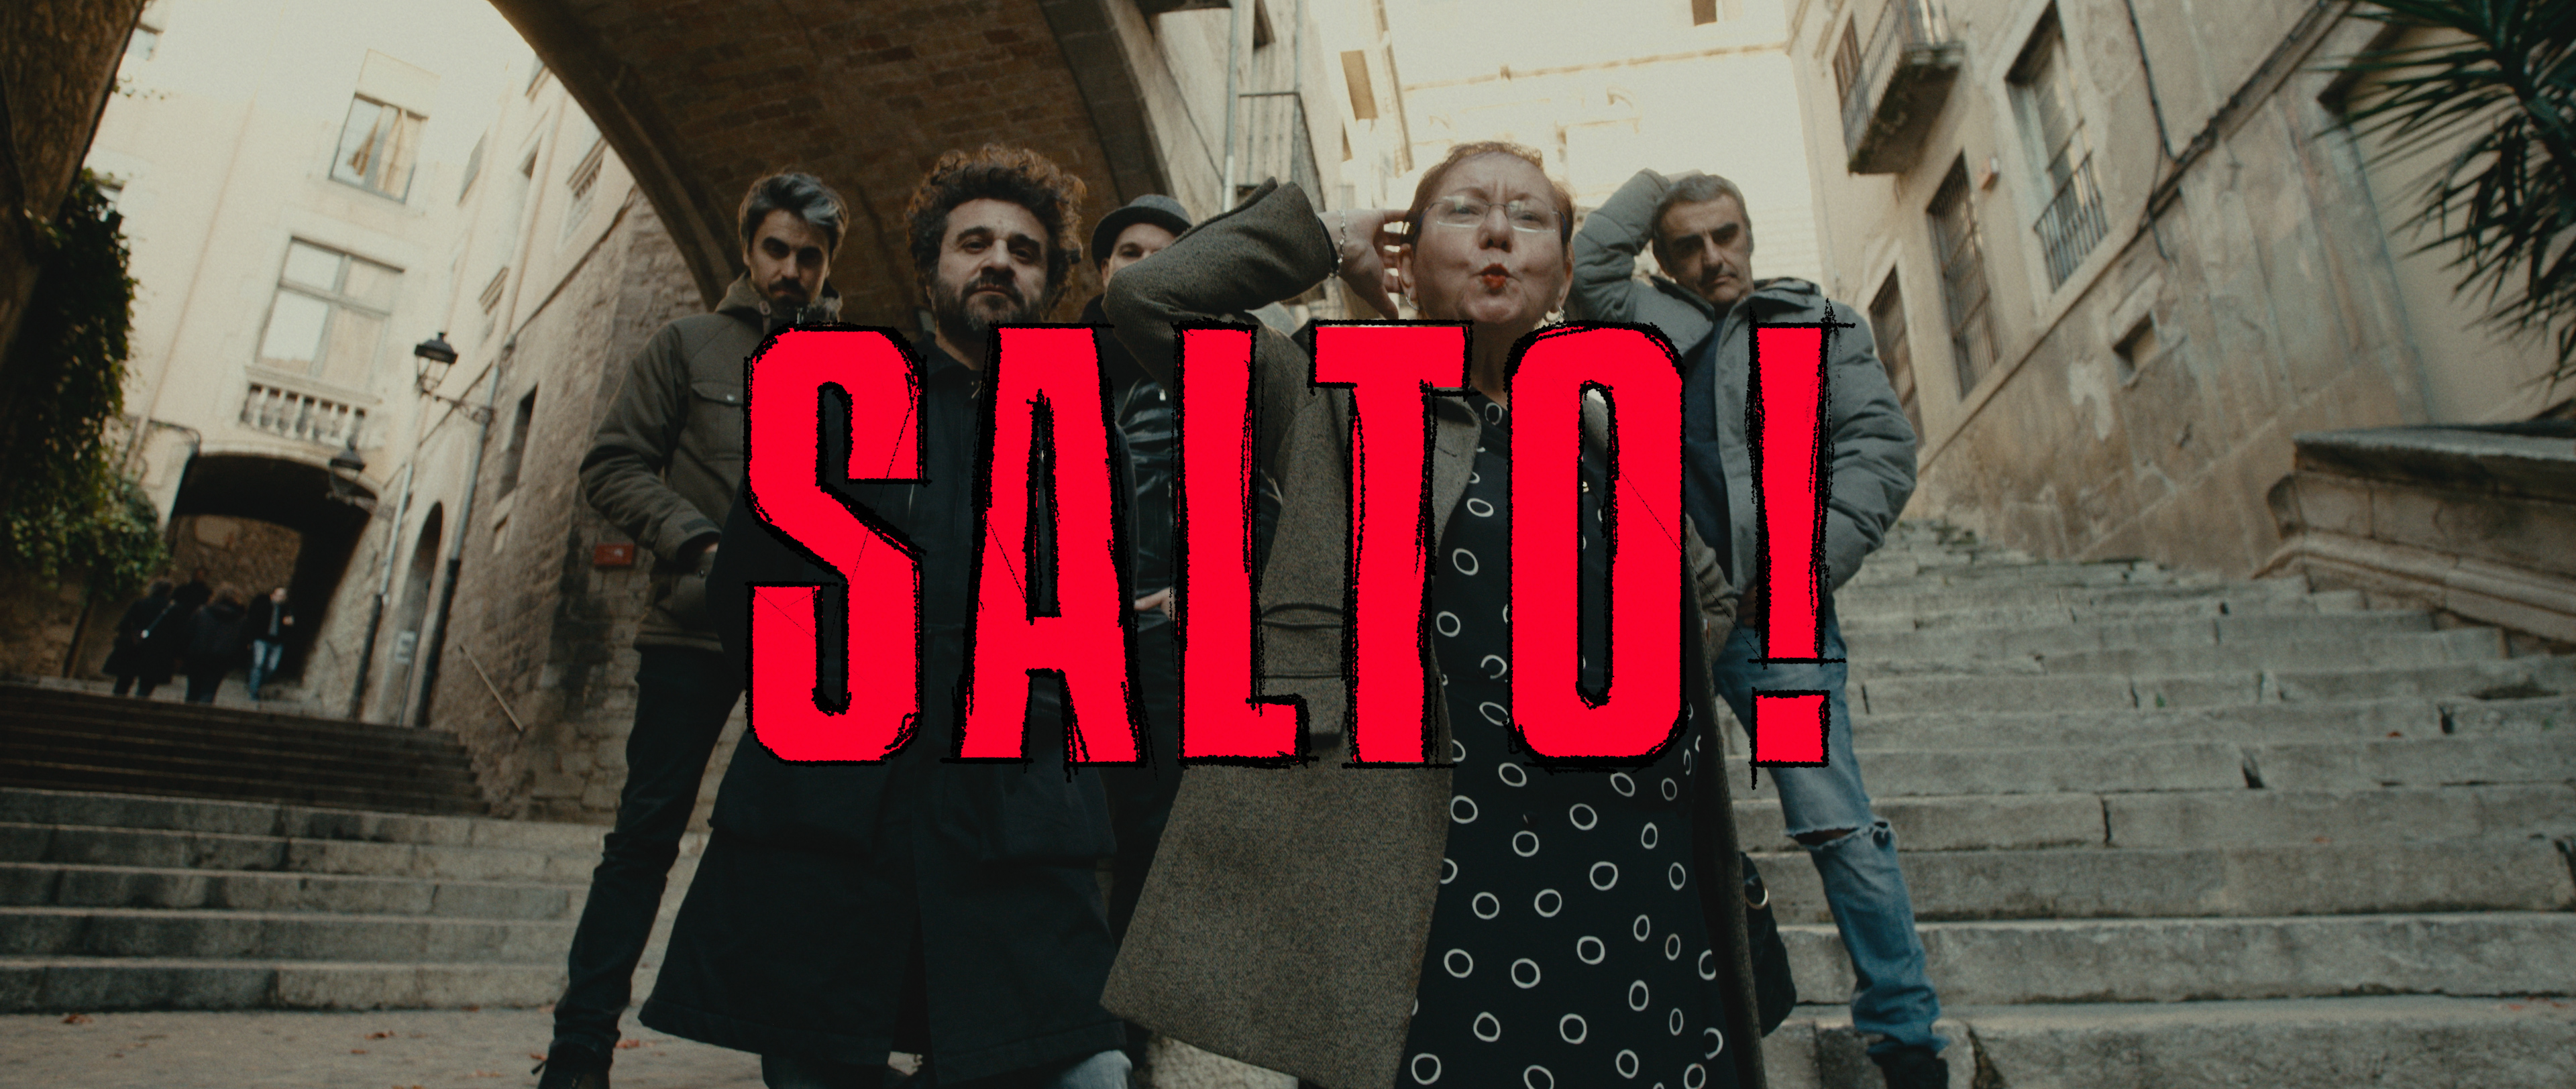 GATIBU - SALTO!